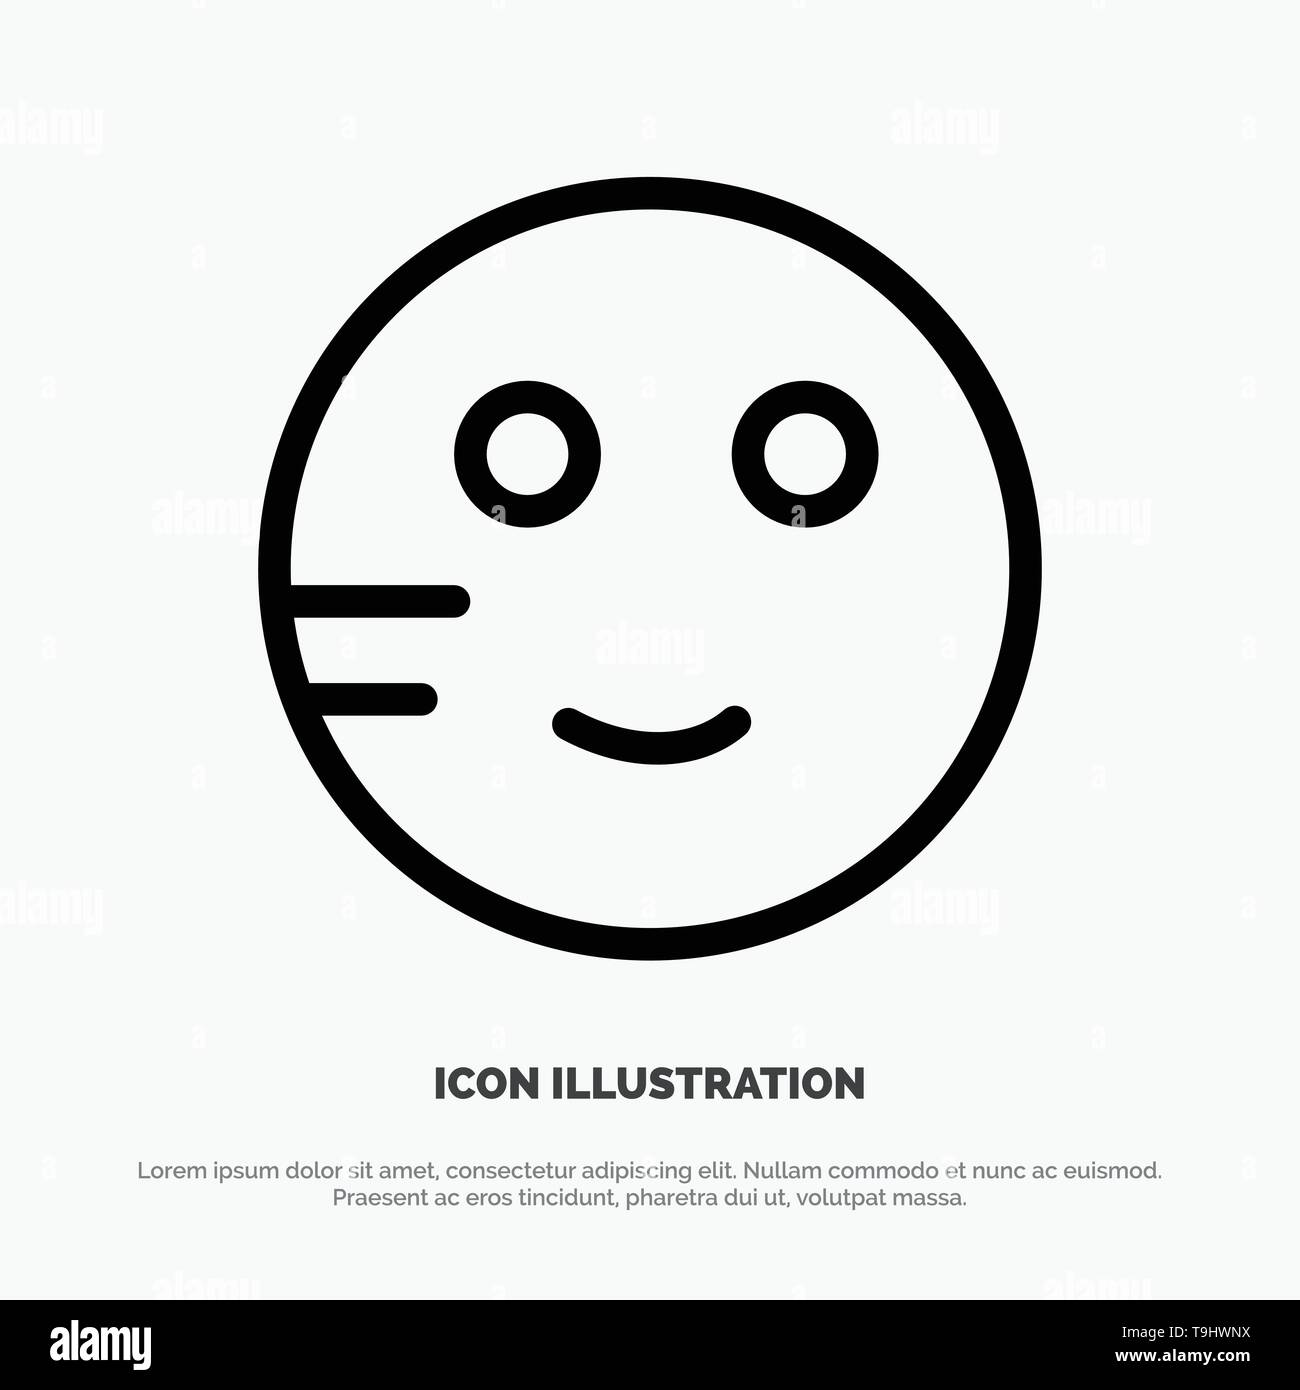 Embarrassed, Emojis, School, Study Line Icon Vector Stock Vector Art